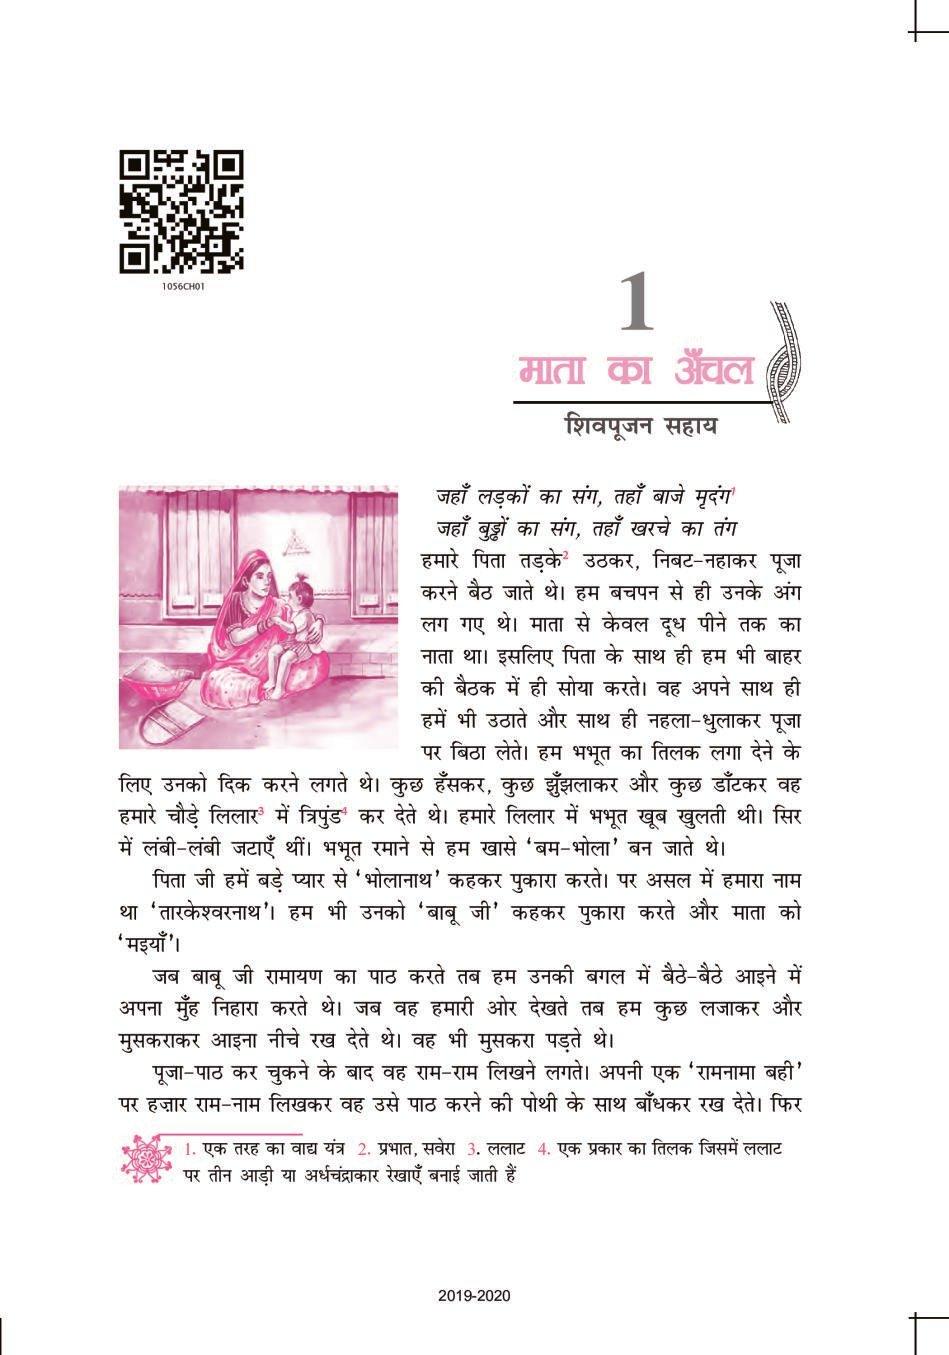 NCERT Book Class 10 Hindi (कृतिका) Chapter 1 माता का अंचल - Page 1